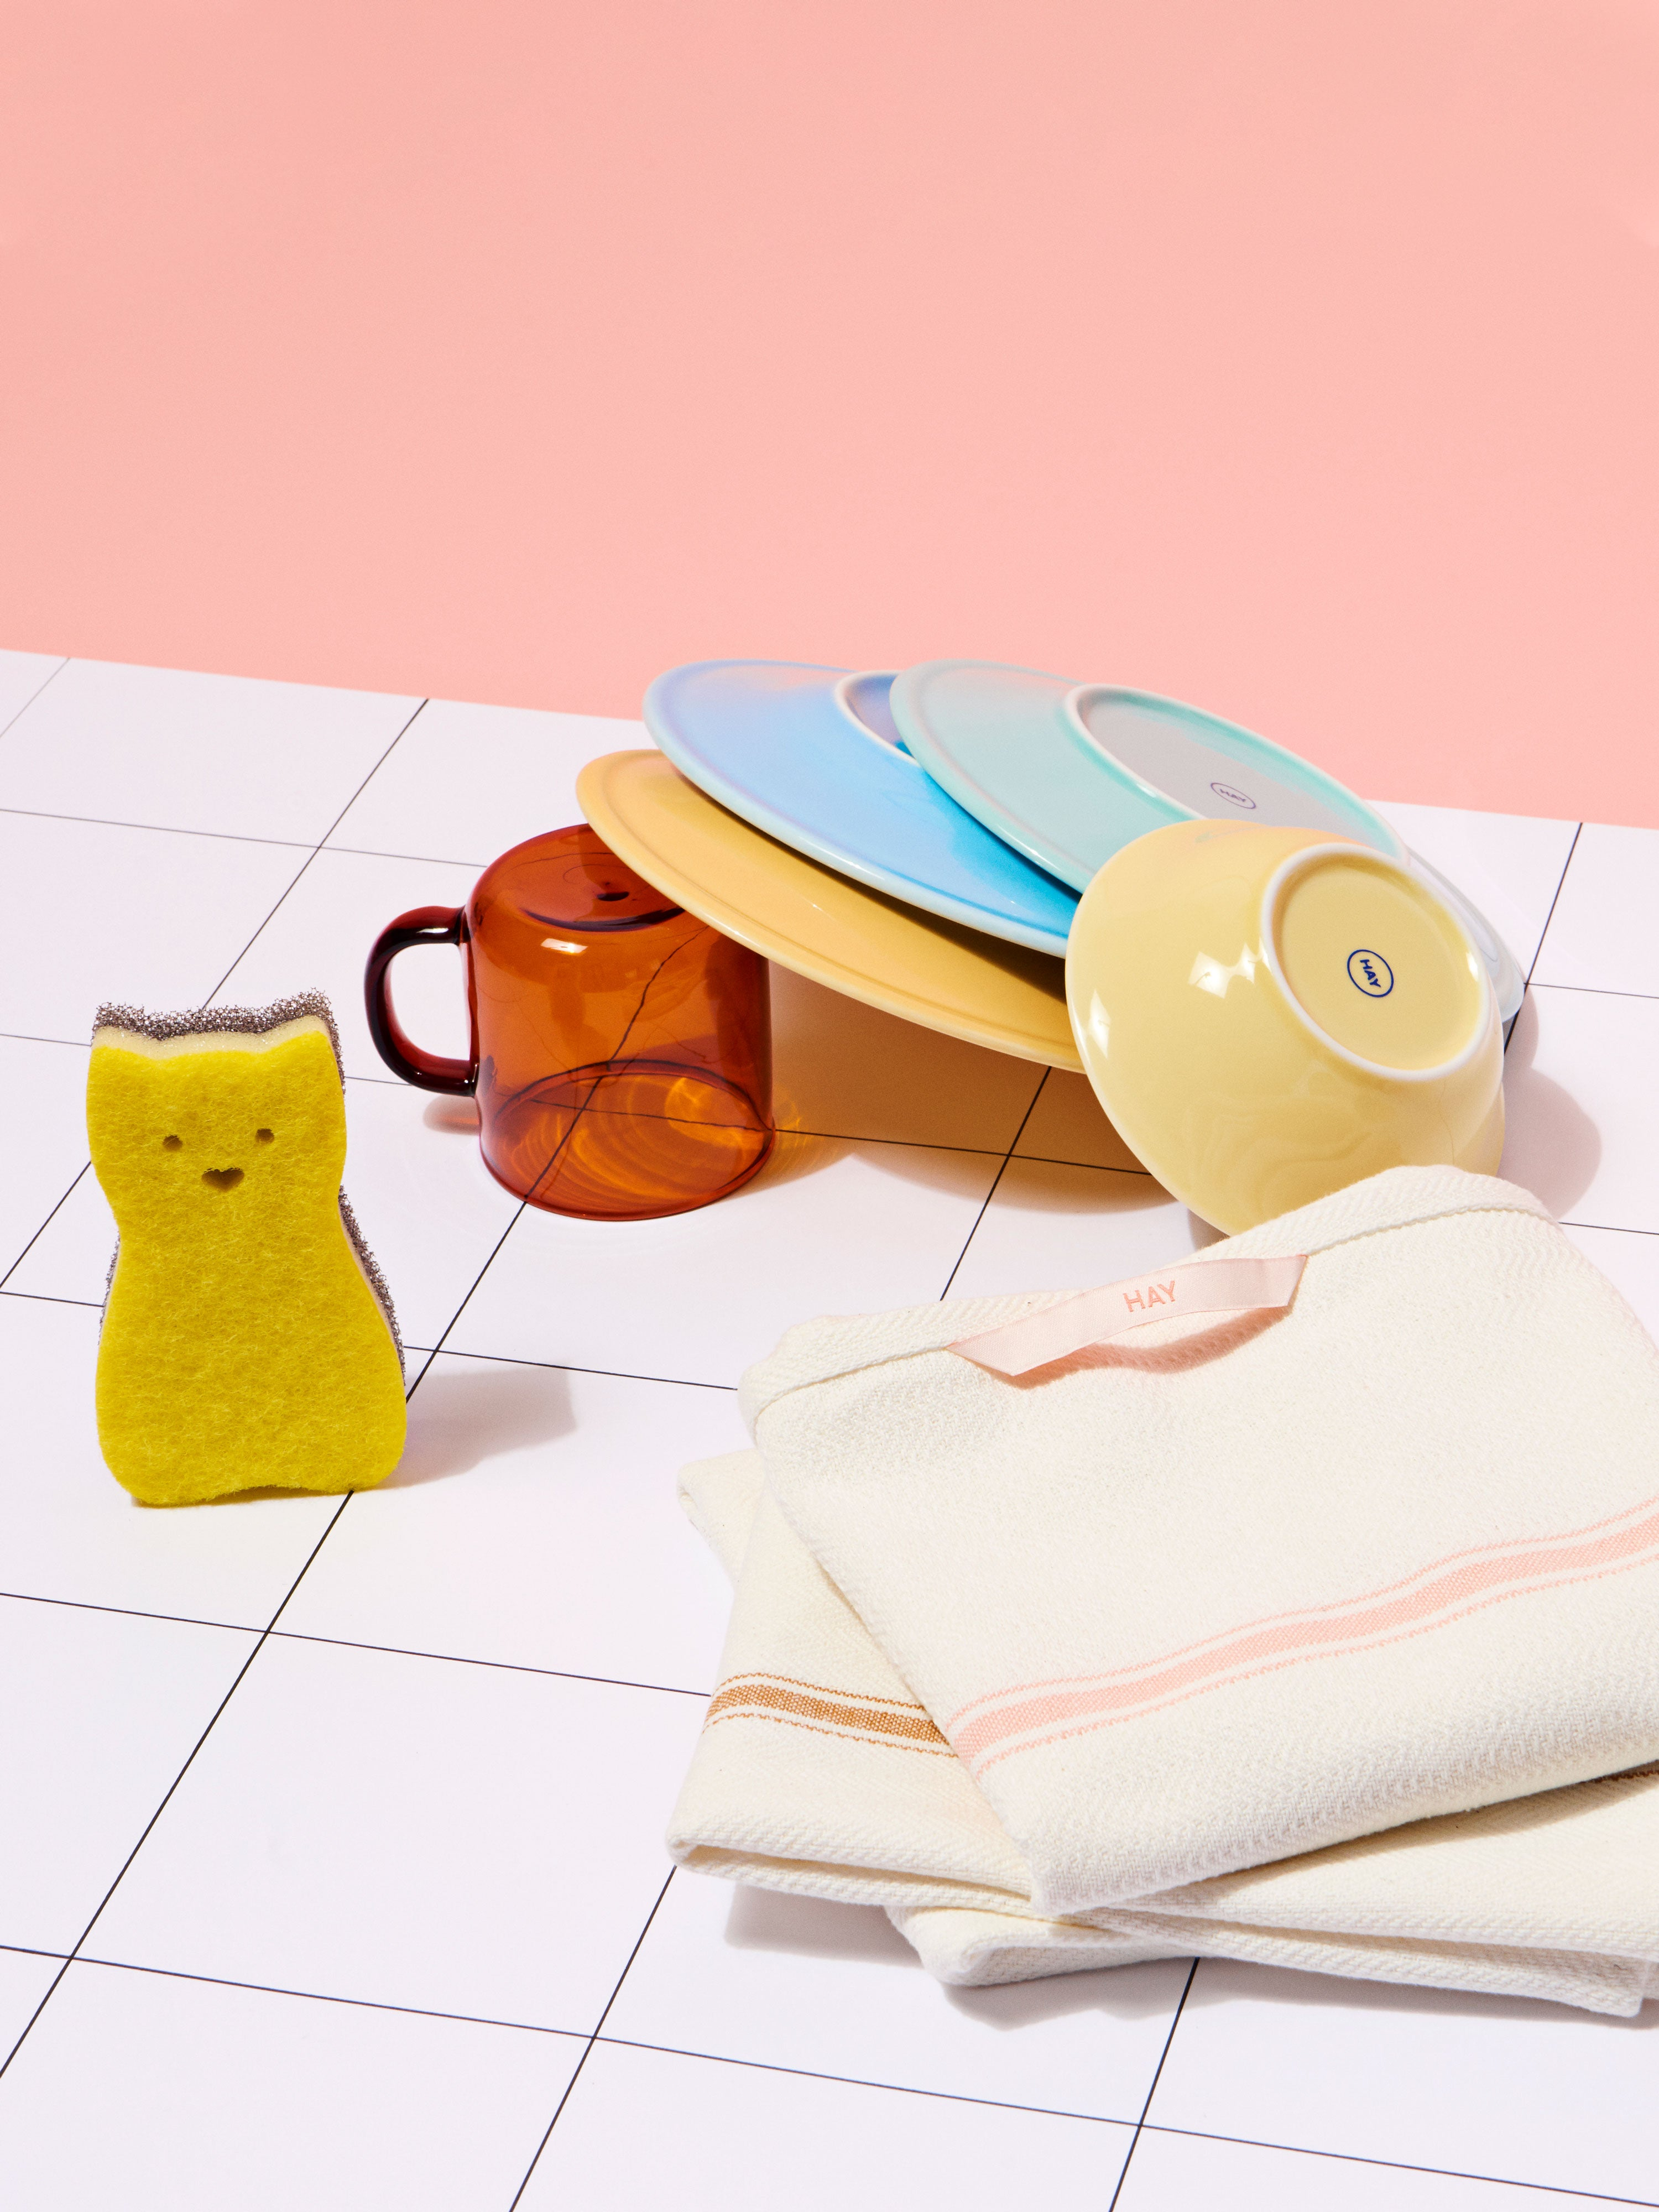 feature_crop_option_Kitchen-Towel_Kitty-Sponge_Rainbow_Borosilicate-Mug